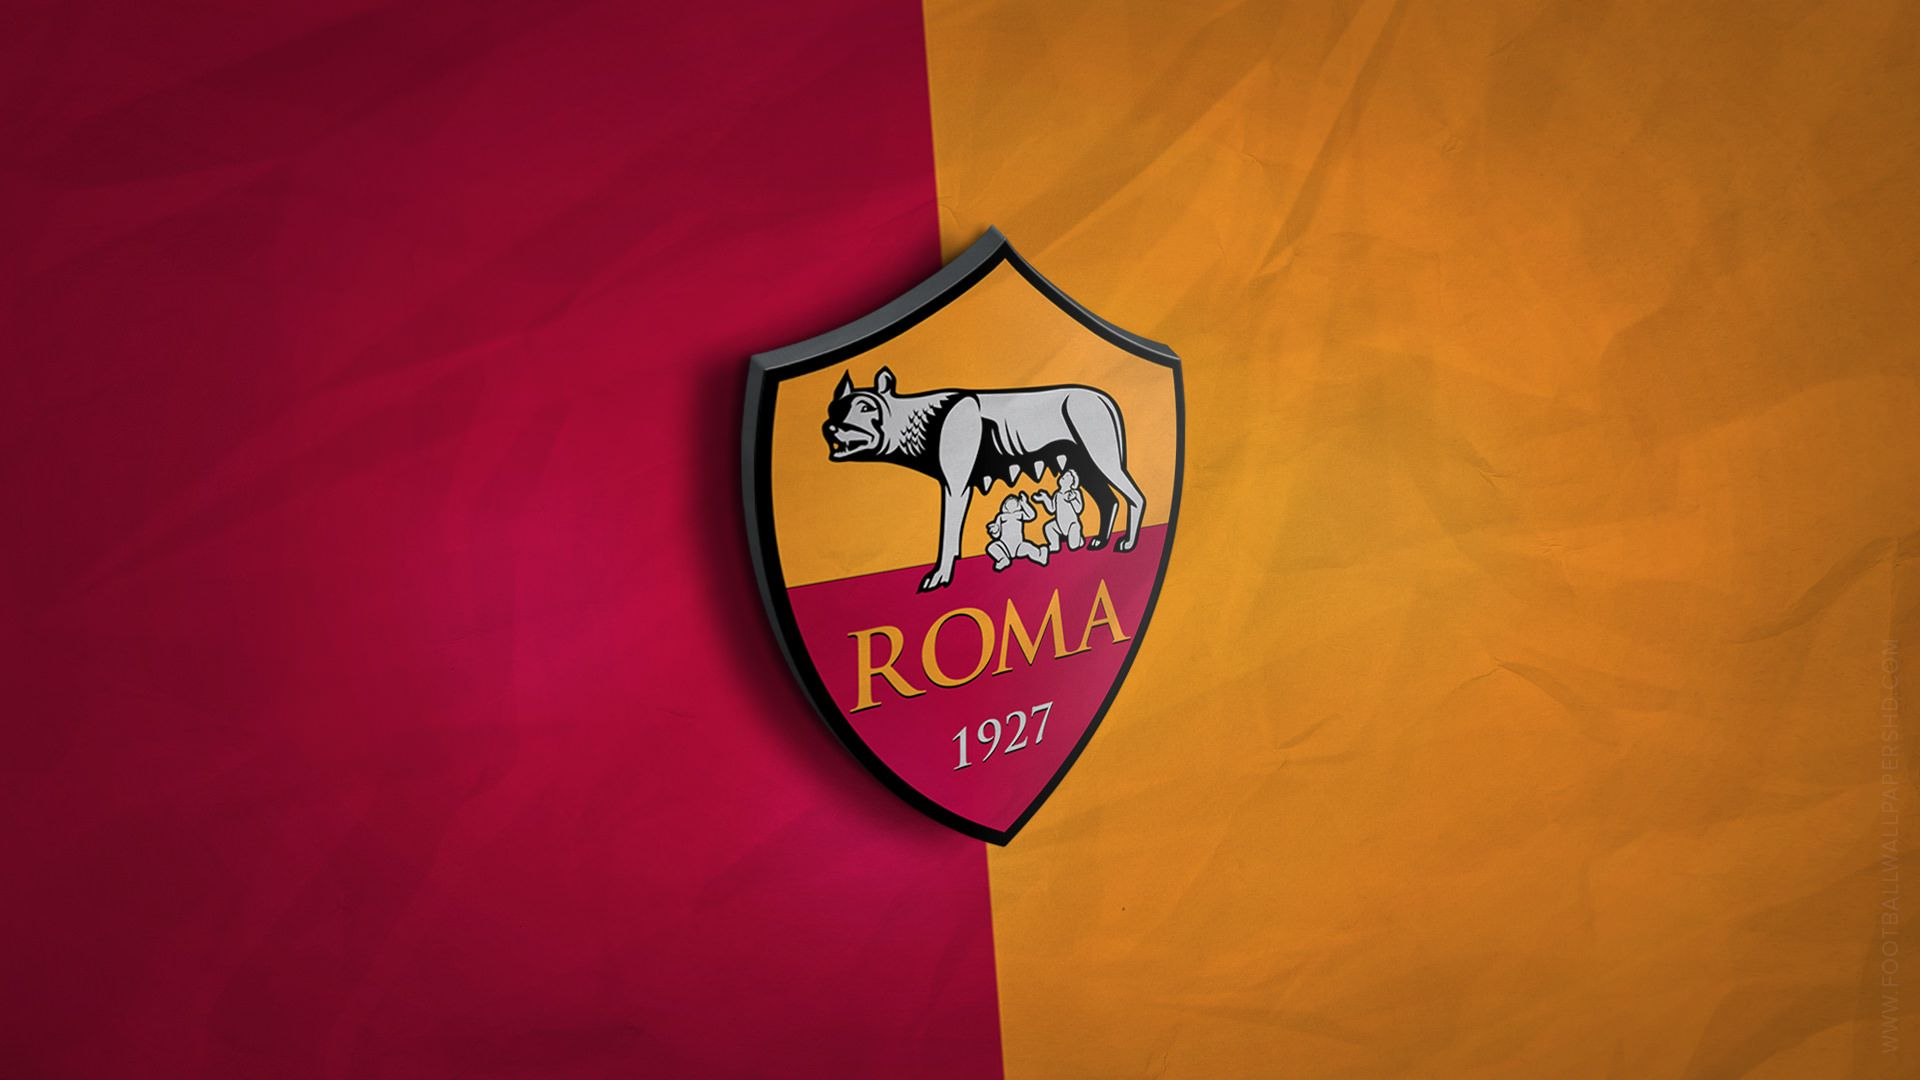 AS Roma 3D Logo Wallpaper - Football Wallpapers HD